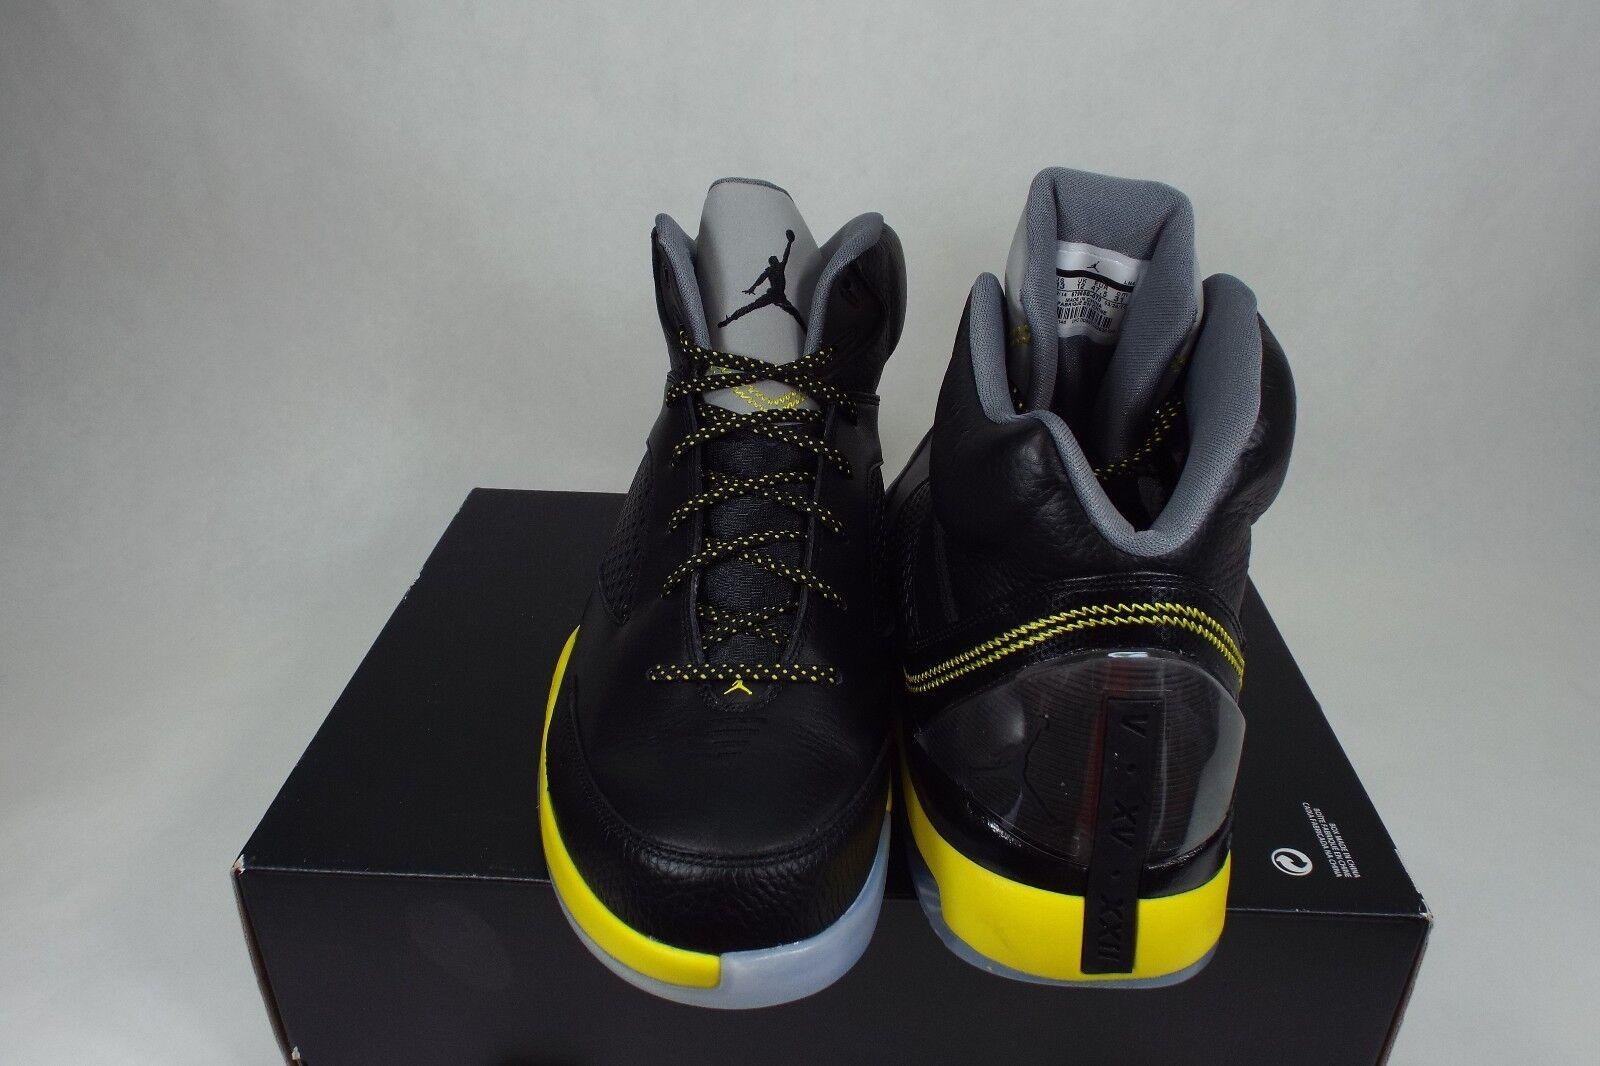 Neue 13 jordan - remix schwarz - - - gelb hohe schuhe 160 679680-070 fb31d8